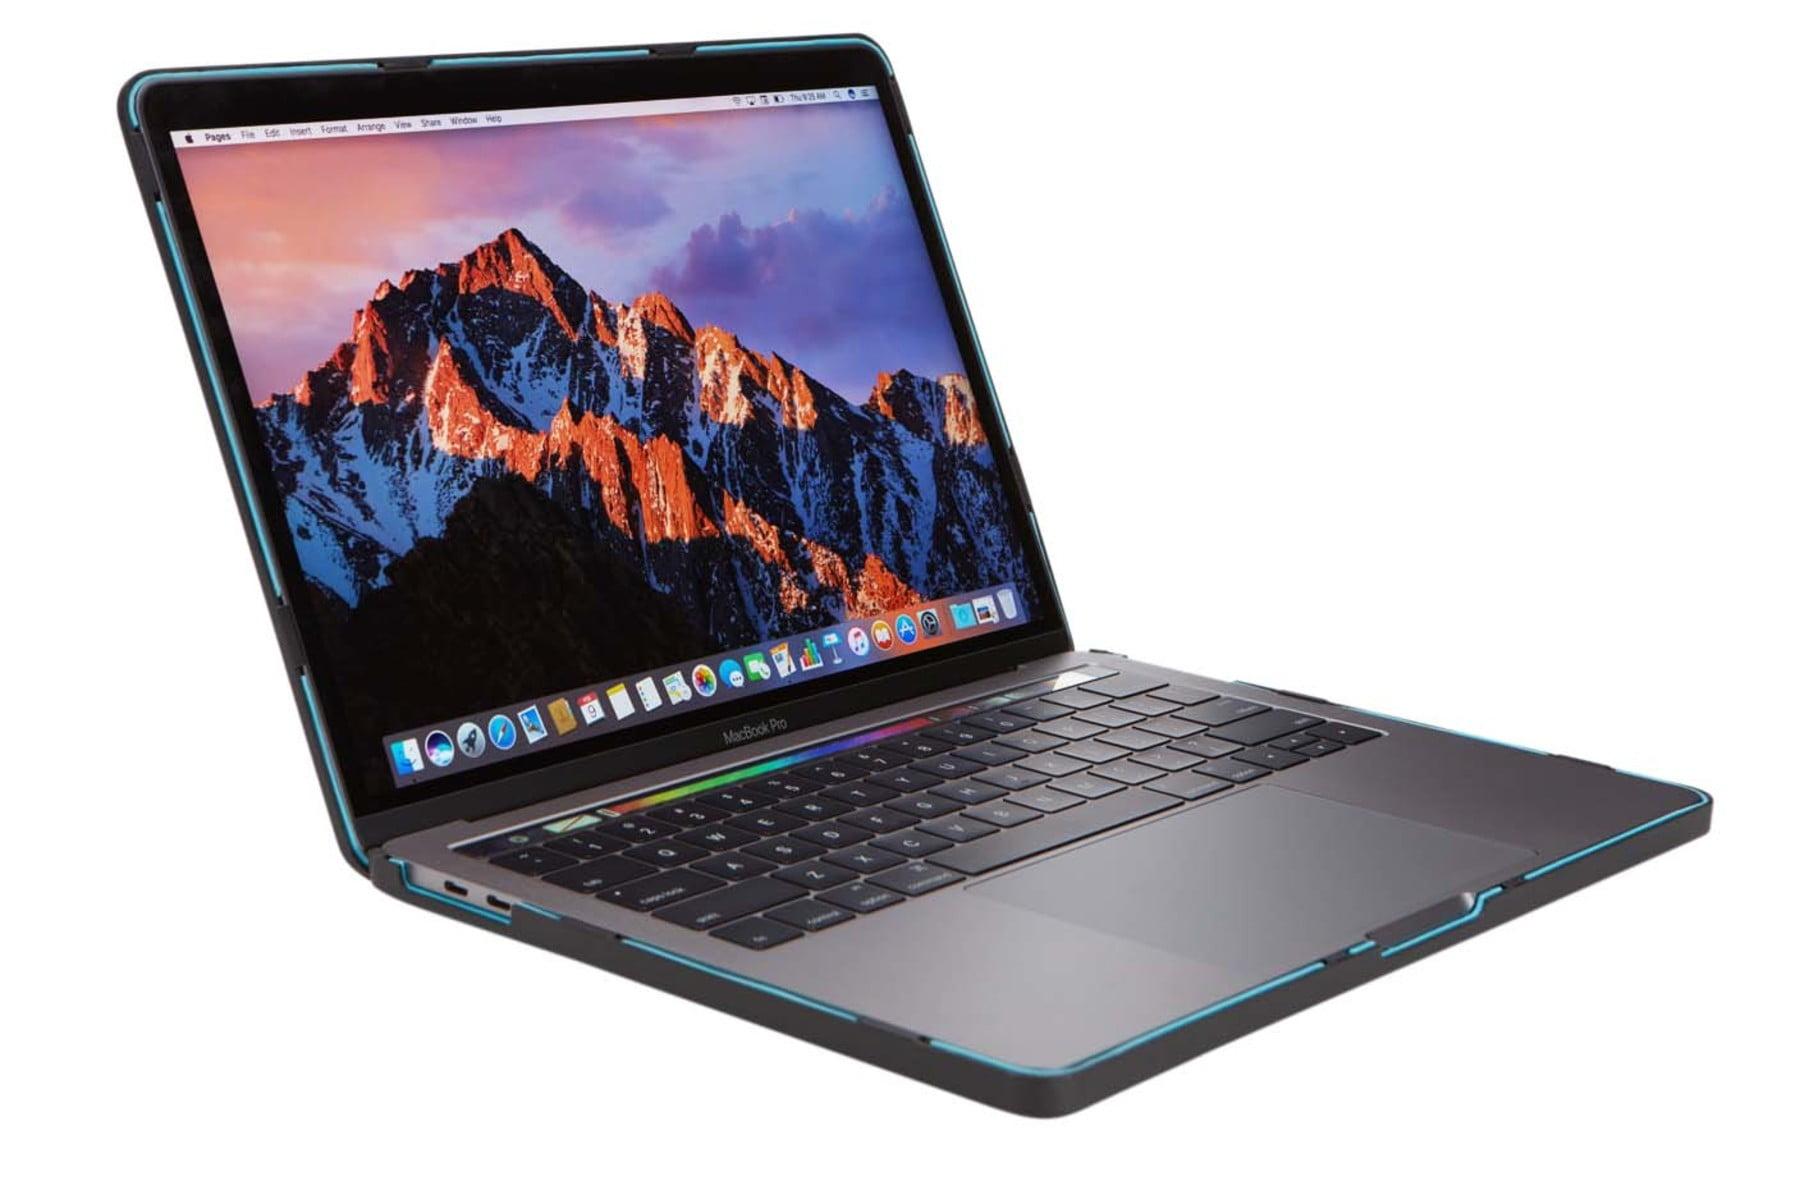 Carcasa laptop Thule Vectros Protective Bumper 13 MacBook Pro Retina 1 2